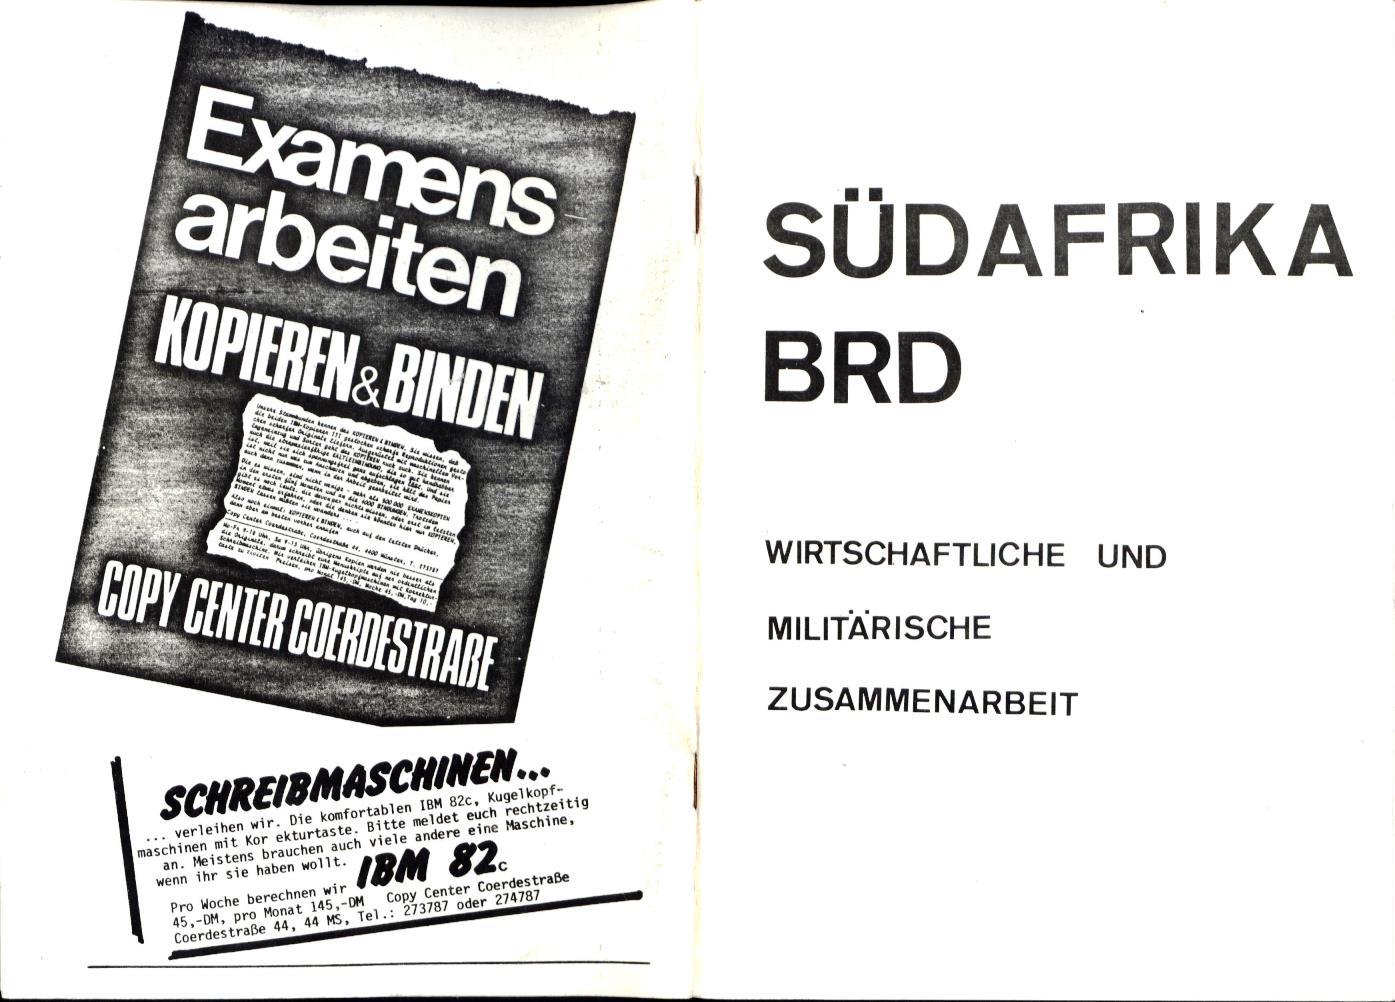 Muenster_AKAFRIK_1981_Suedafrika_BRD_01